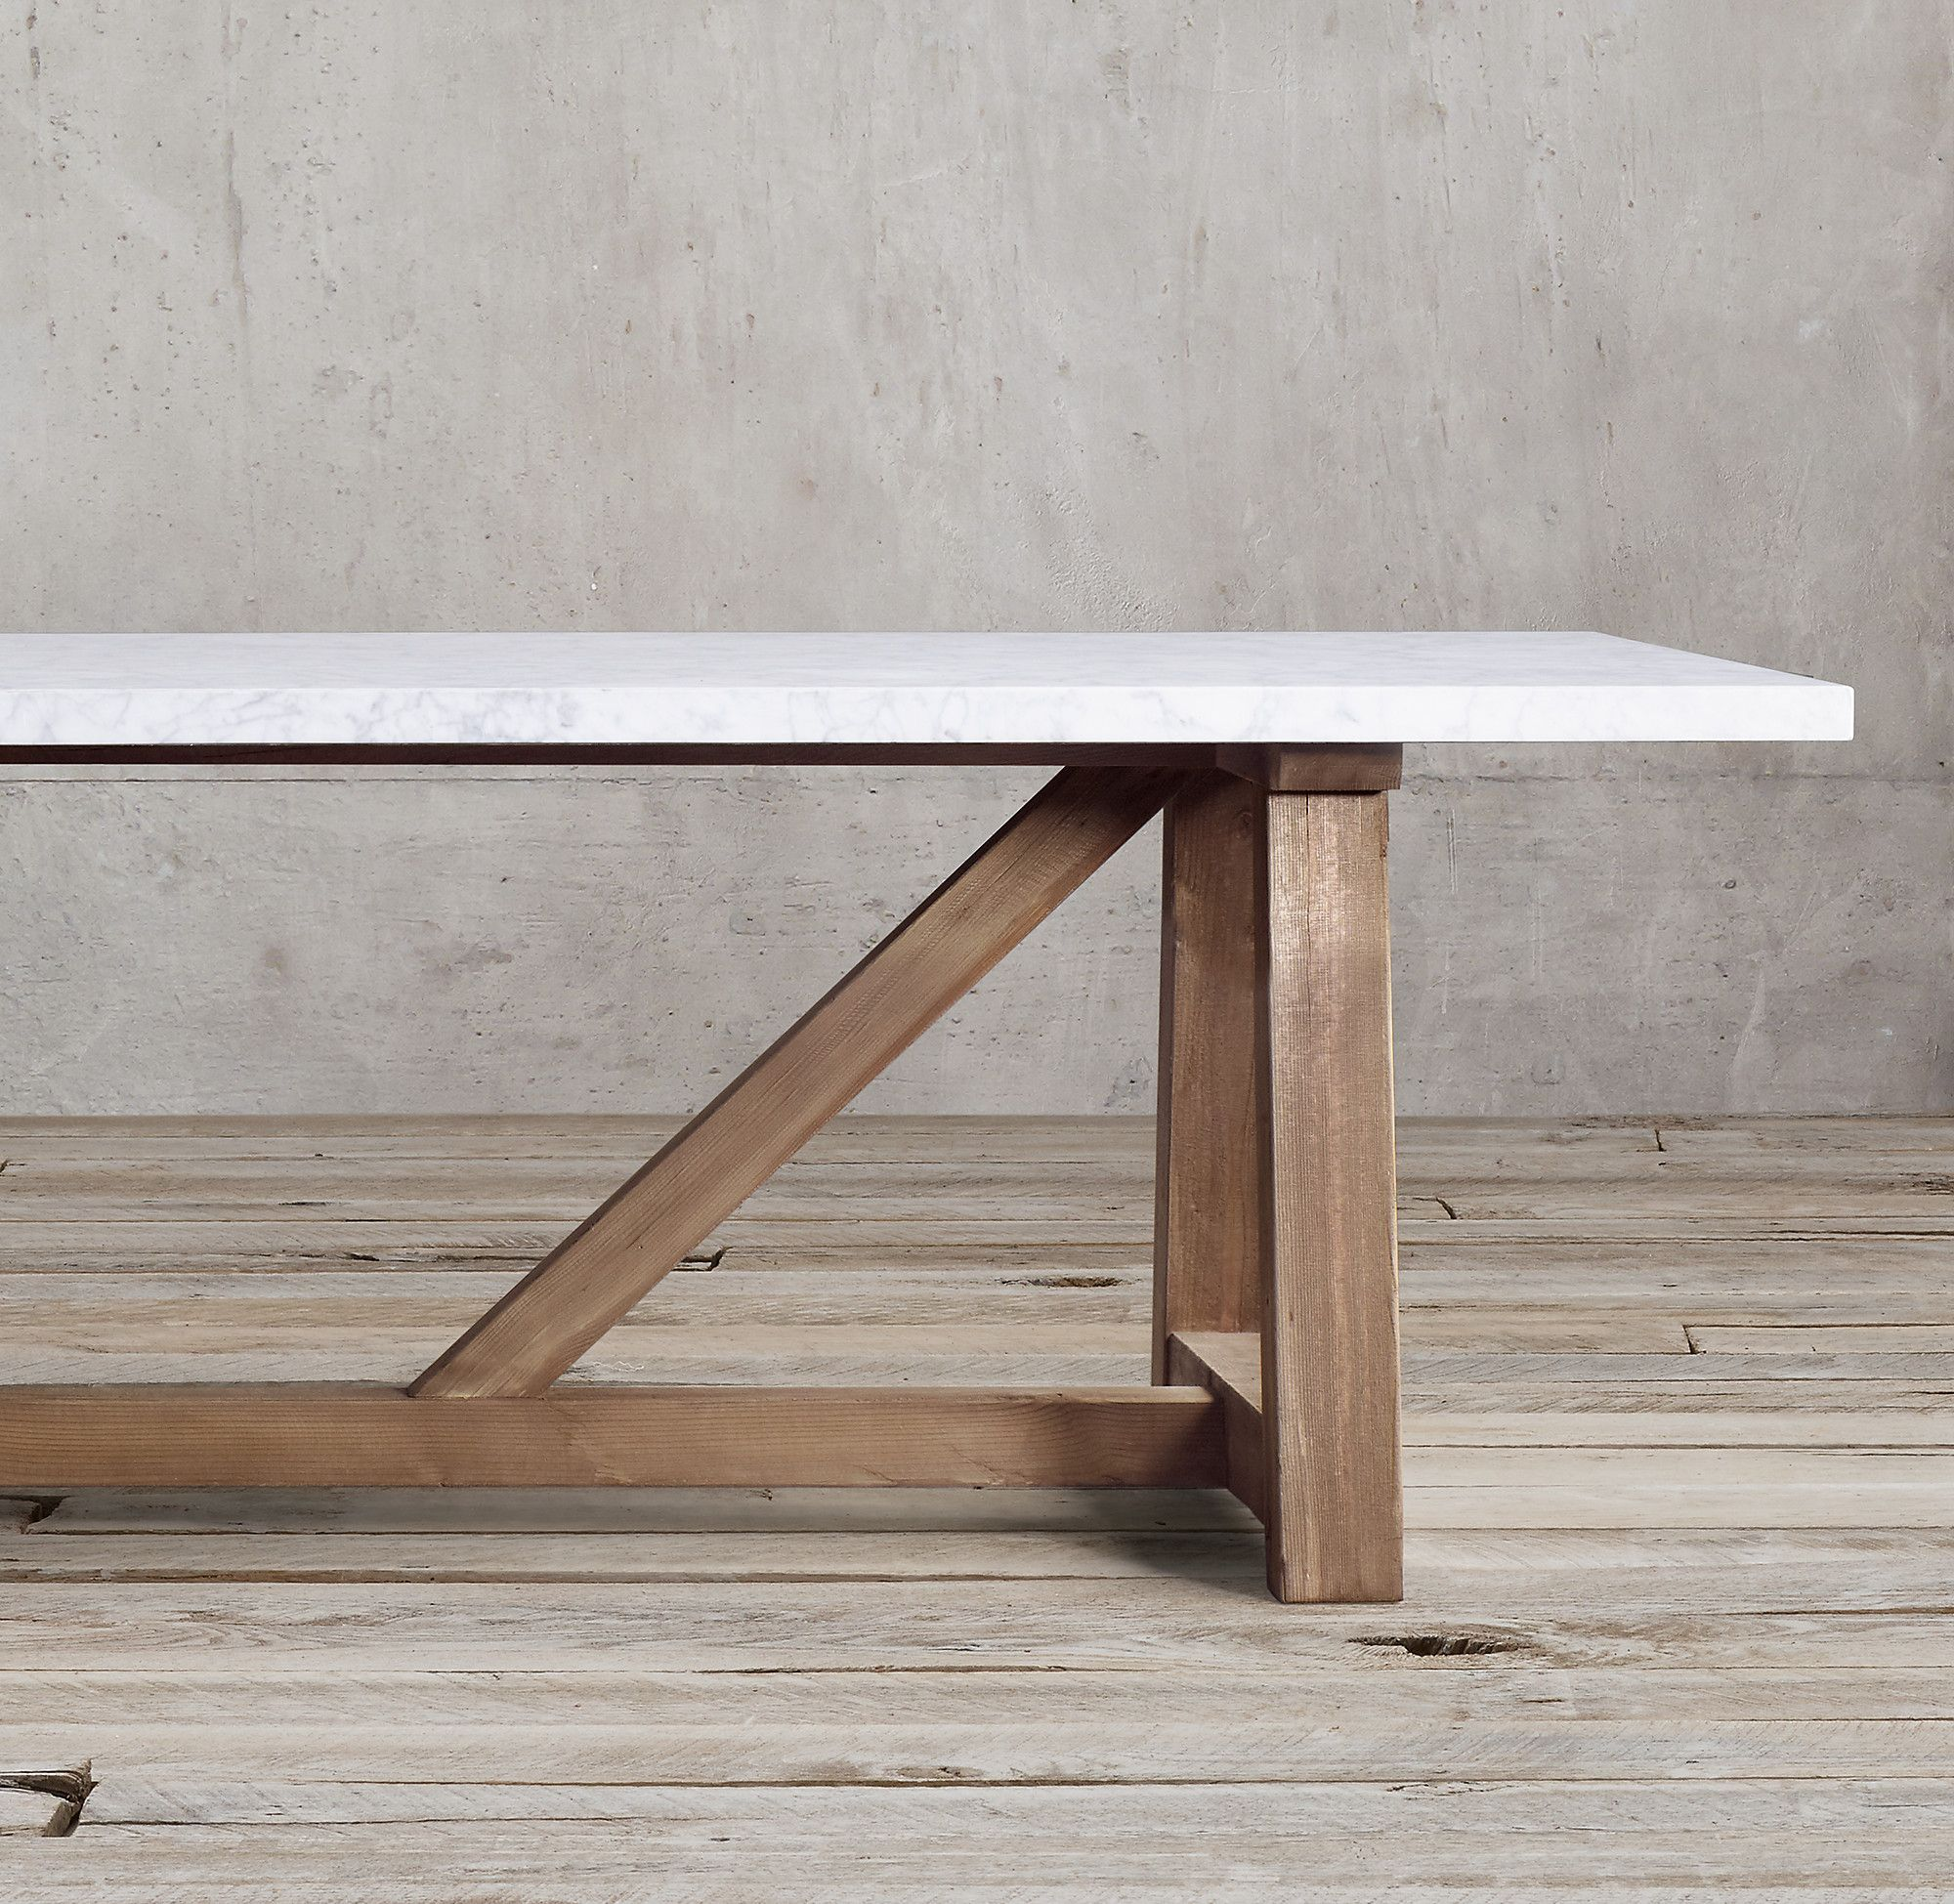 Salvaged Wood Marble Beam Rectangular Dining Table Dining Table Rectangular Dining Table Salvaged Wood Furniture